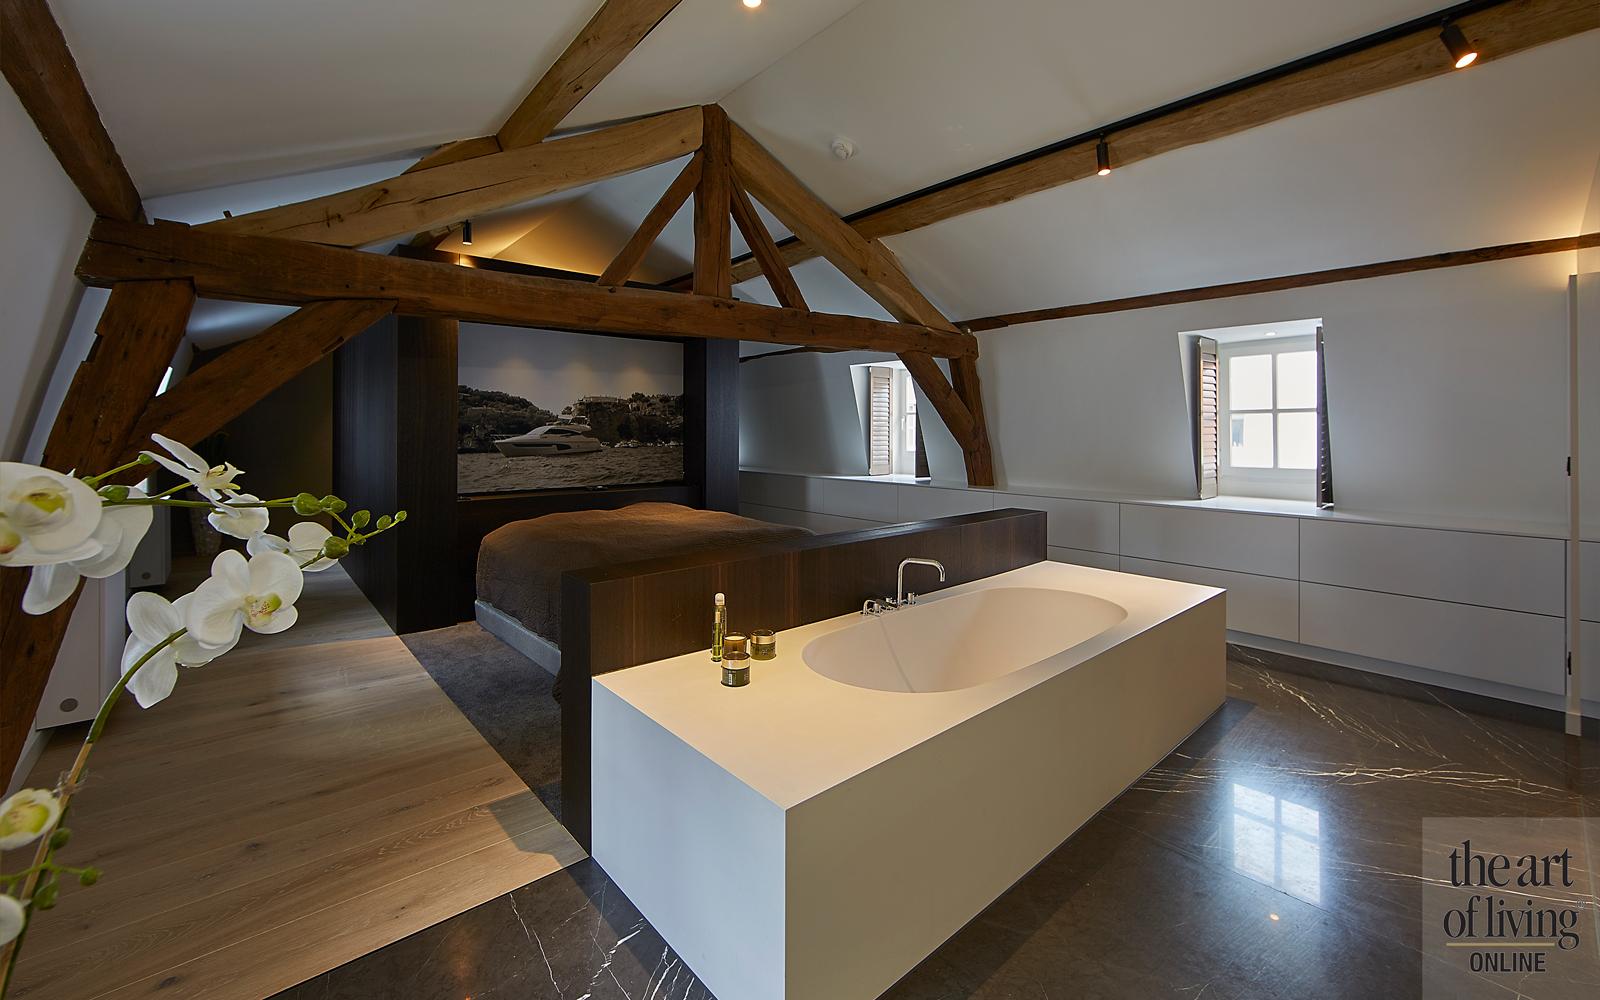 Stadsvilla | ZuidArchitecten, the art of living